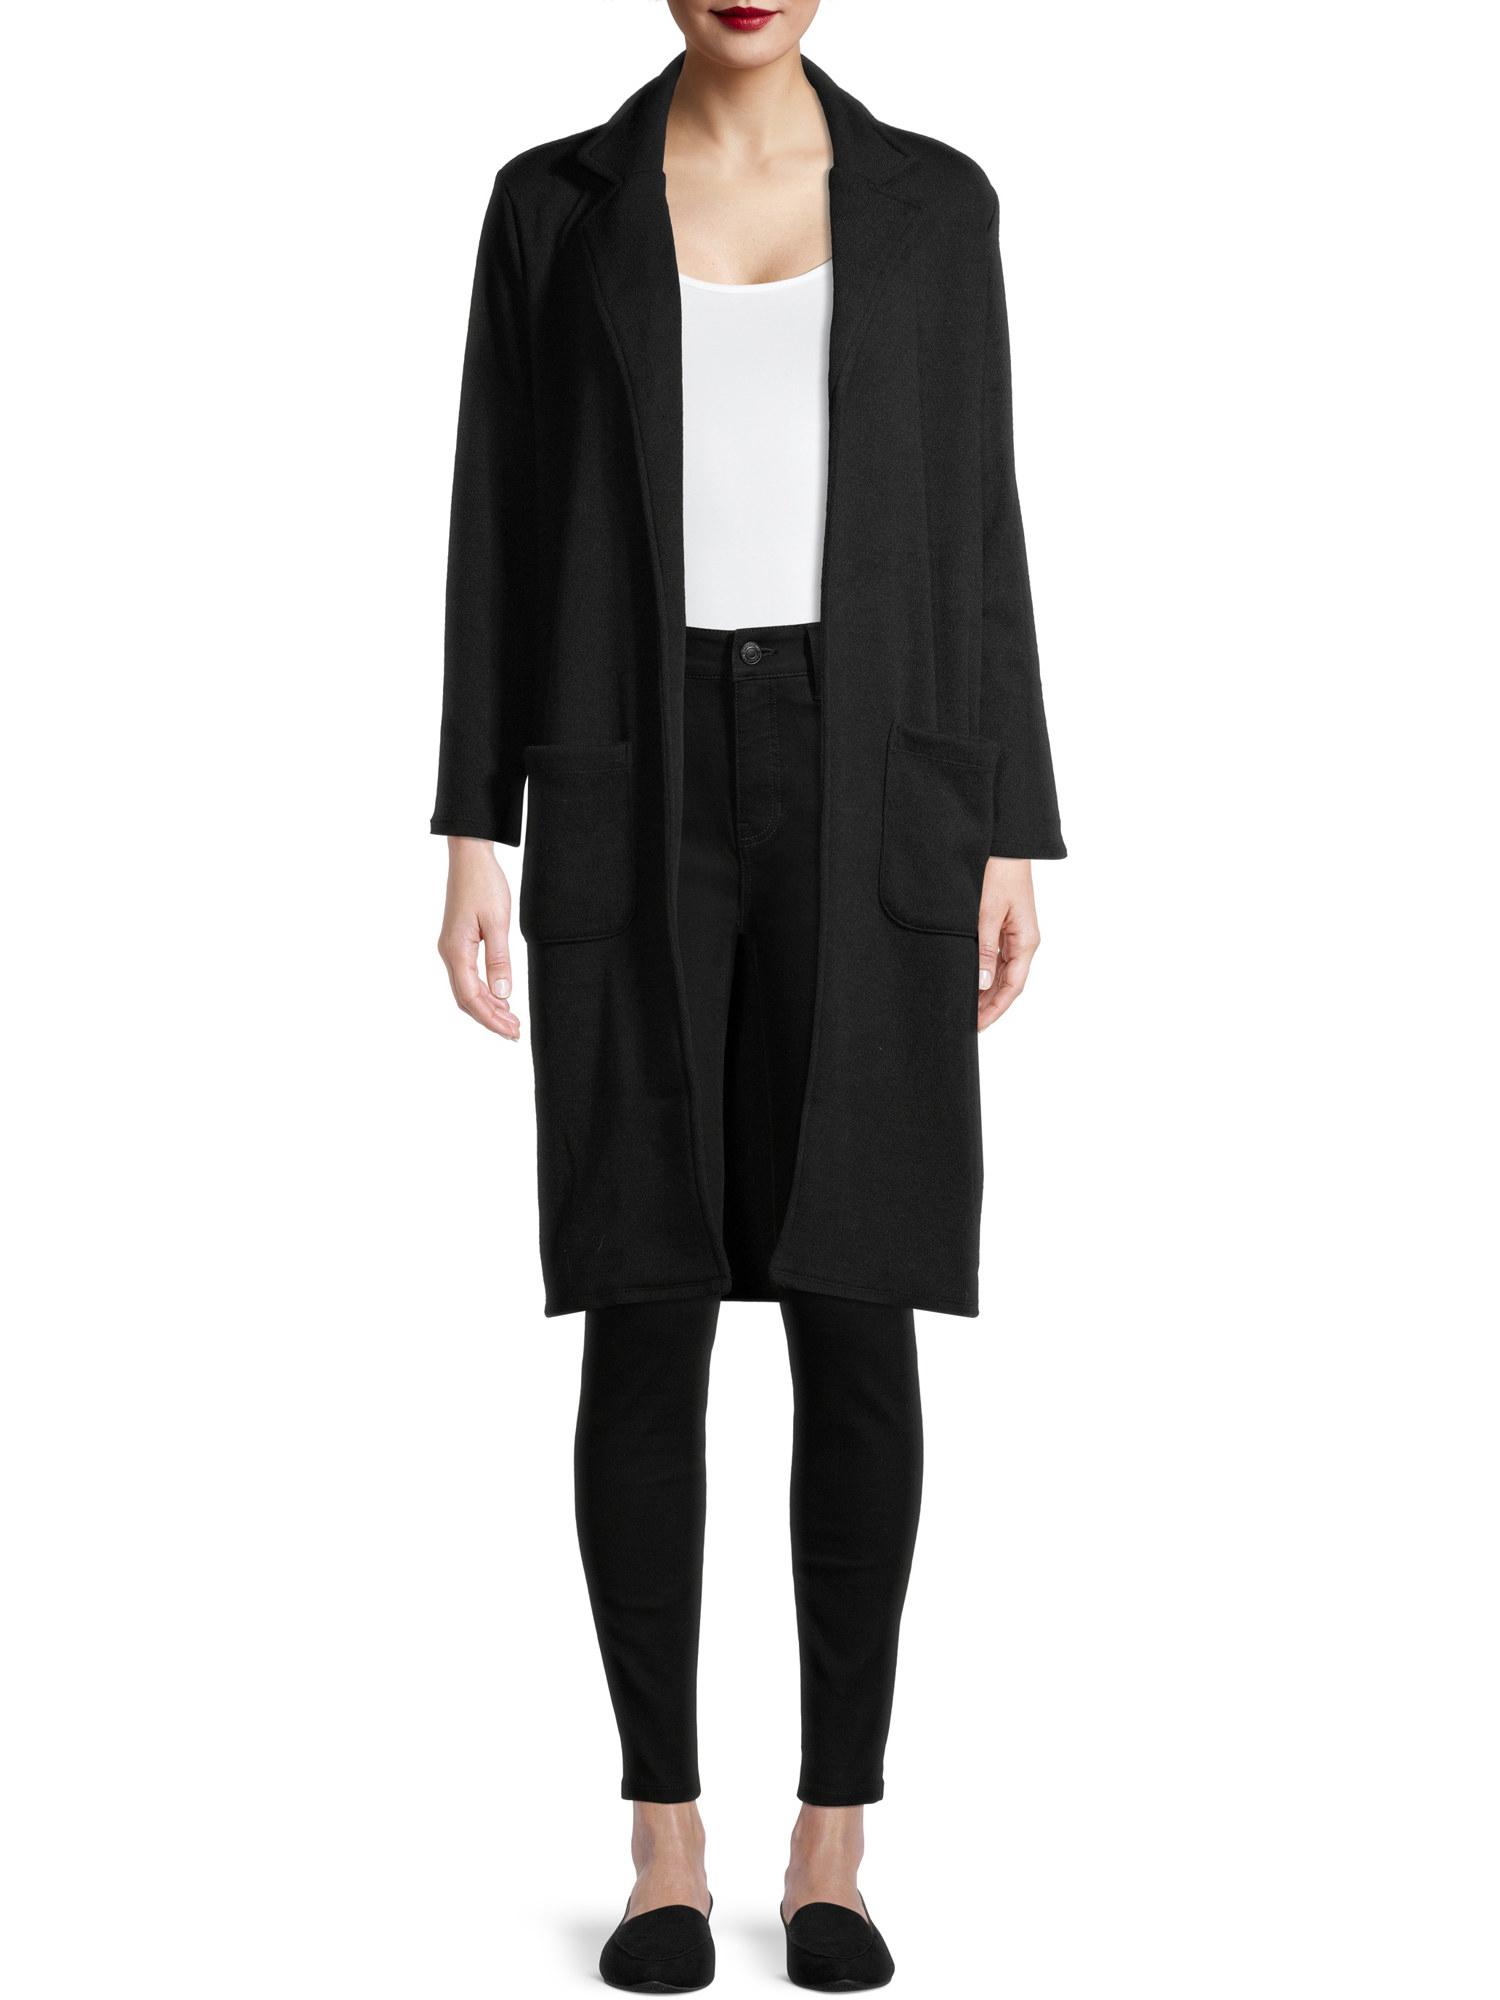 Model wearing a long black cardigan coat, white t-shirt, black jeans, and black shoes